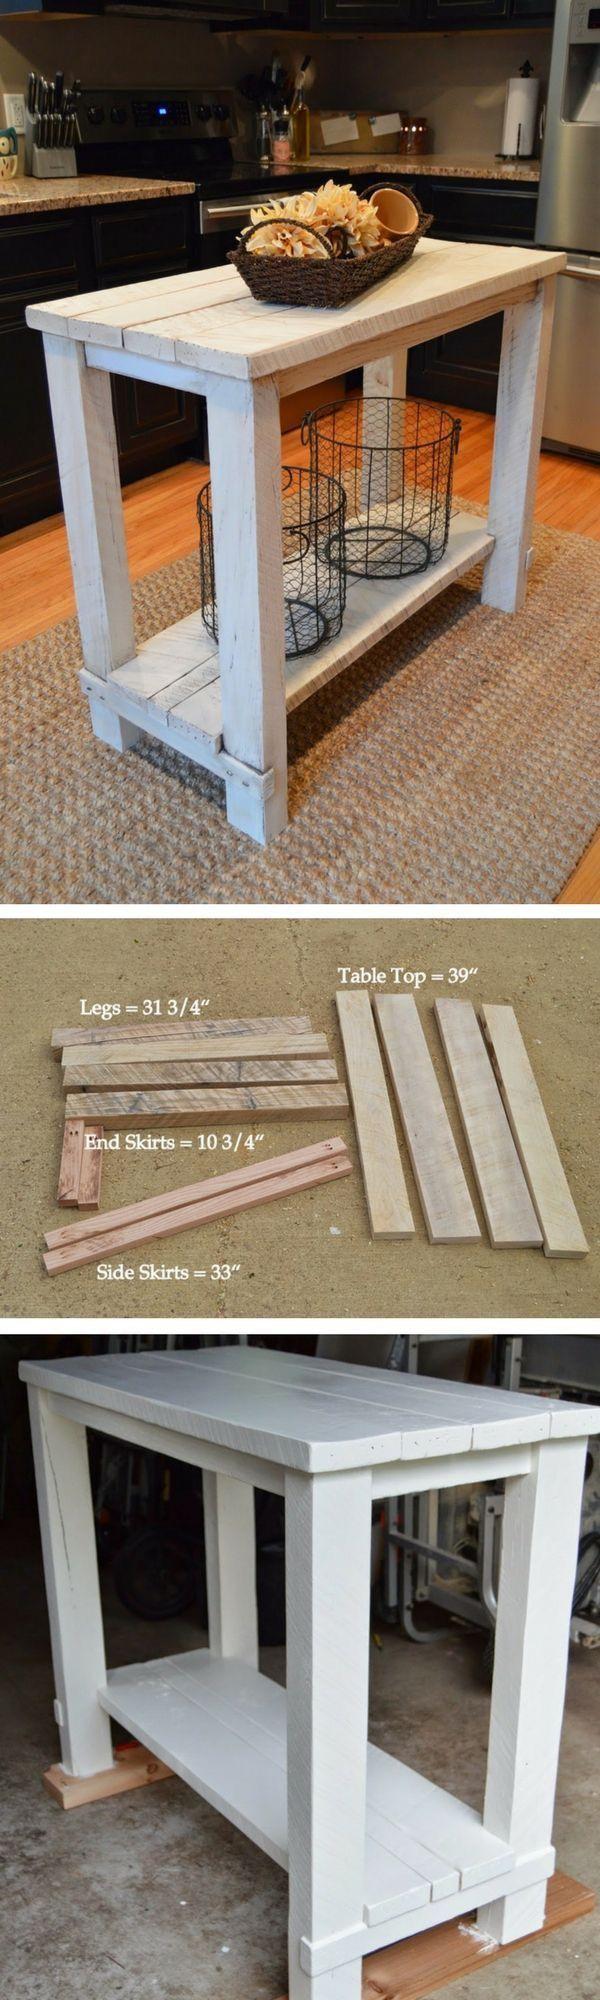 diy kitchen island table desk quick and simple ad diyfurniture farmhouse fixerupper on kitchen island ideas diy id=30922